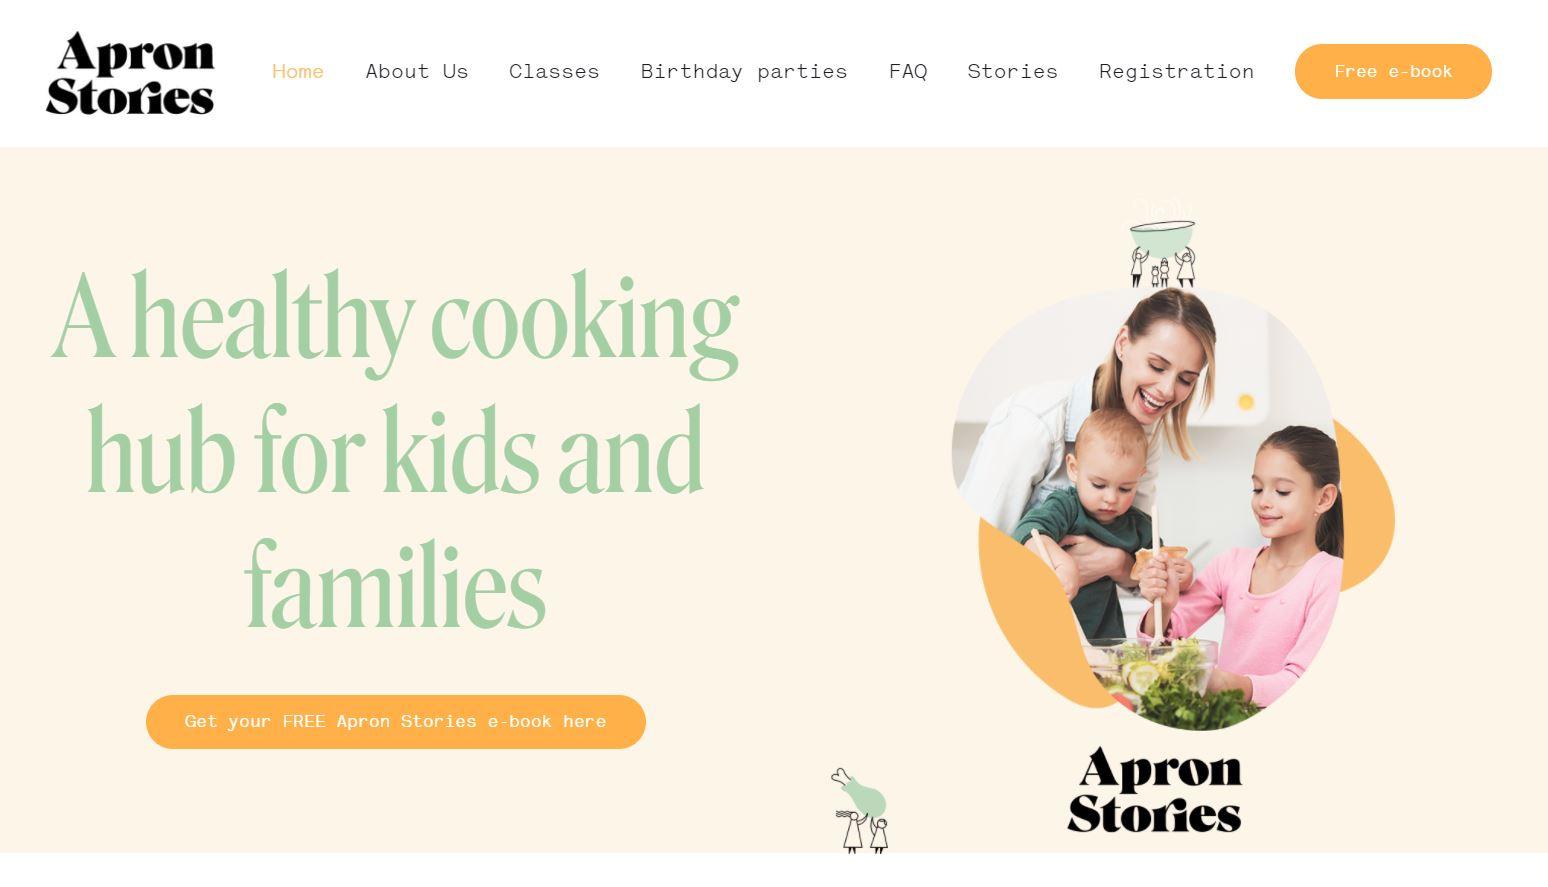 Apron Stories desktop landingpage